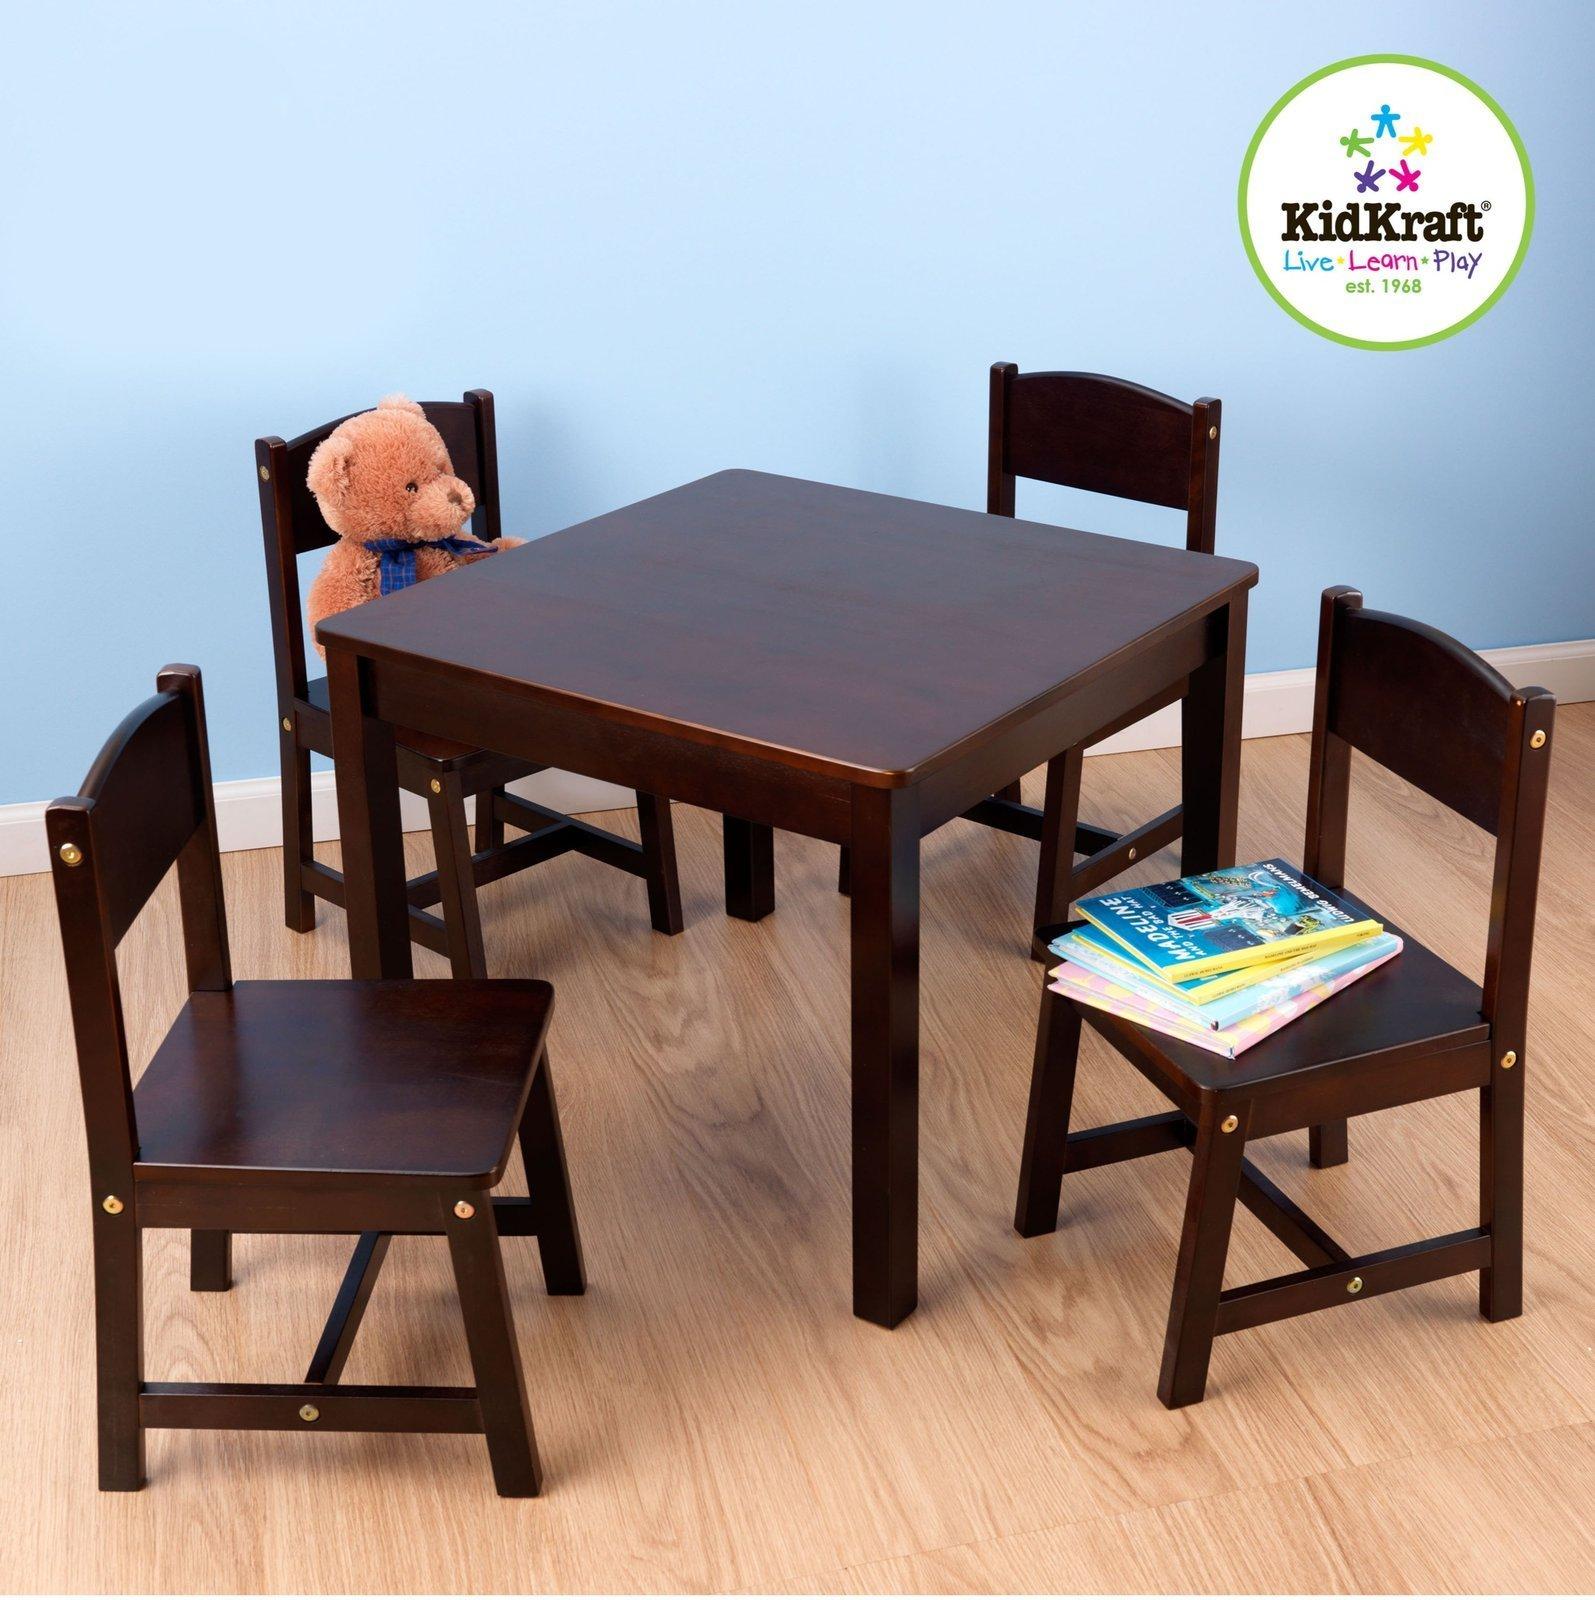 KidKraft Farmhouse Table and Chair Set by KidKraft